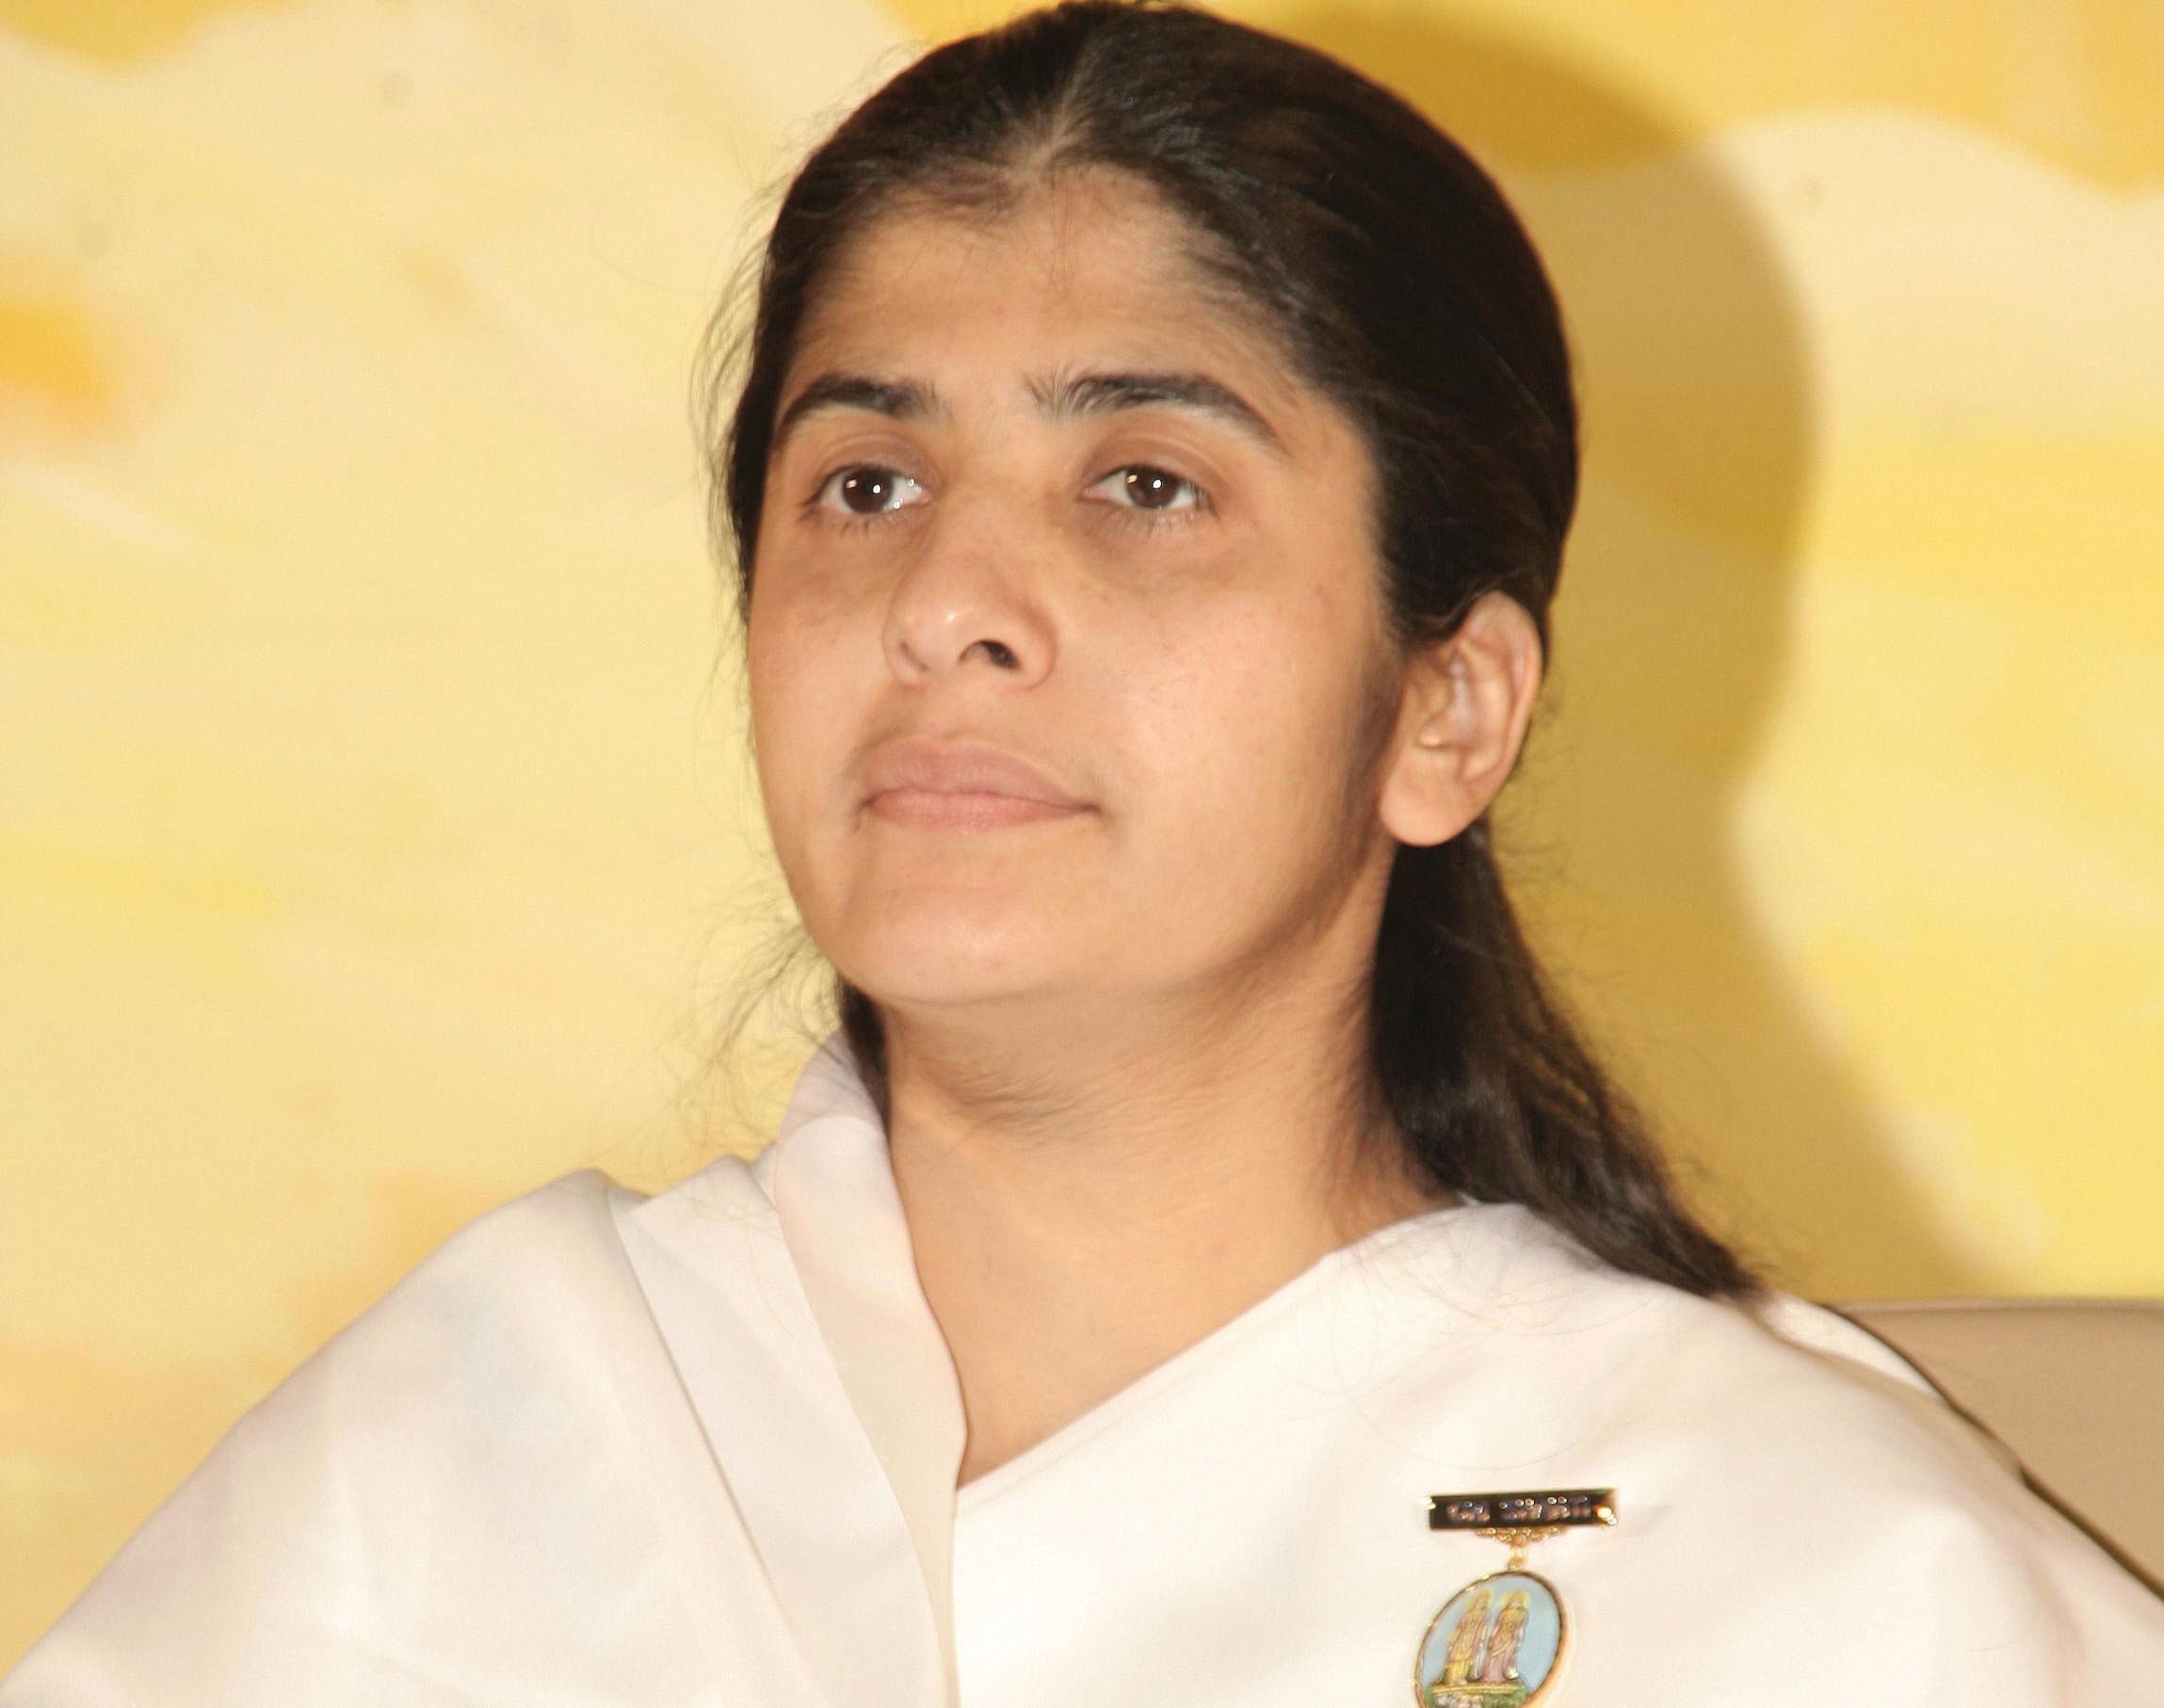 Spiritual Teacher Sister Shivani Biography in Hindi